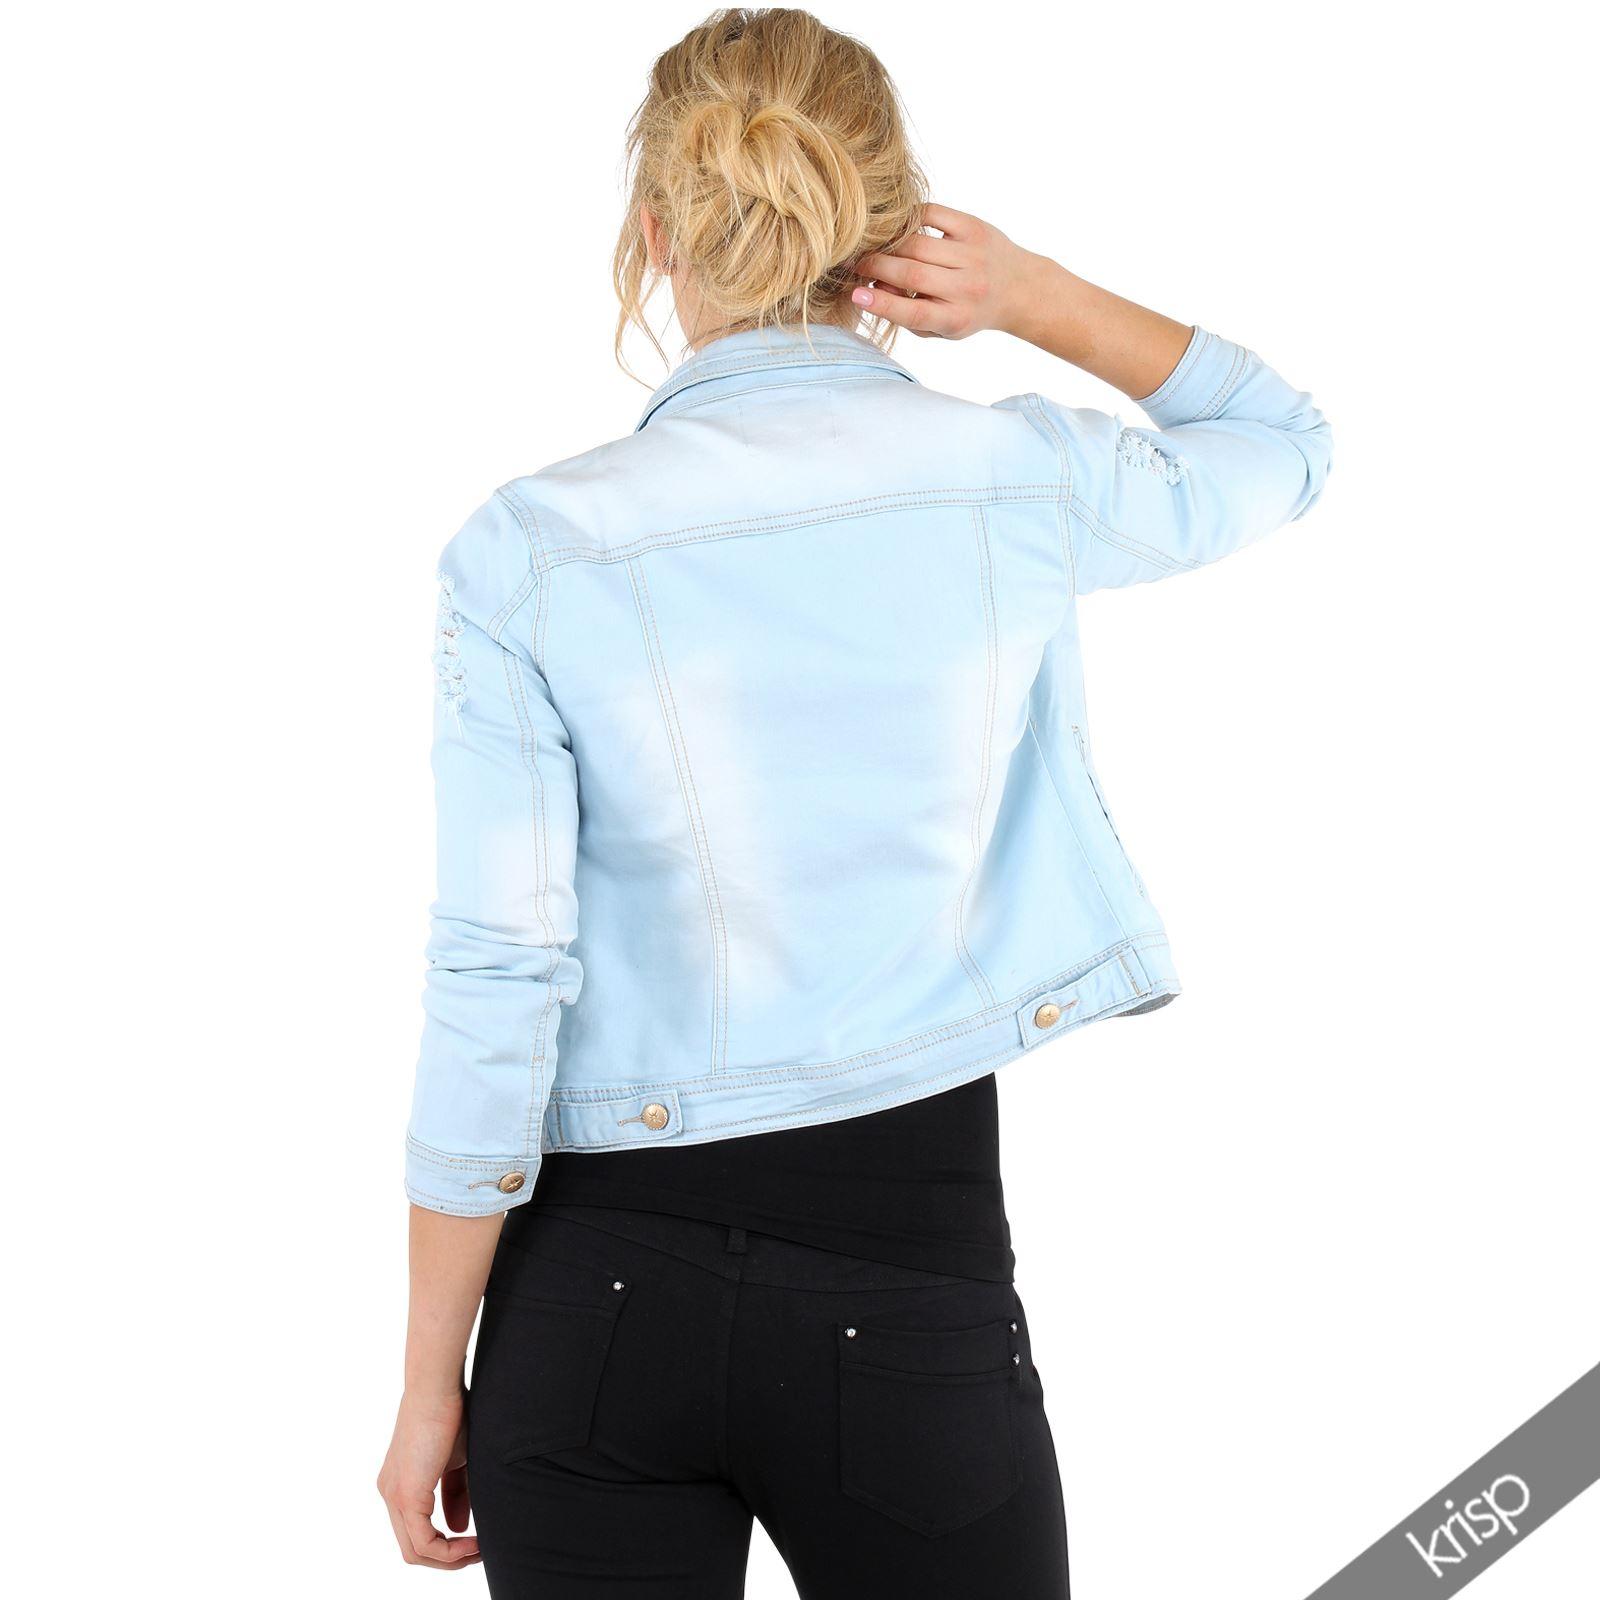 damen d nne jeans jacke denim gebleicht zerrissen kurze sommerjacke basics ebay. Black Bedroom Furniture Sets. Home Design Ideas